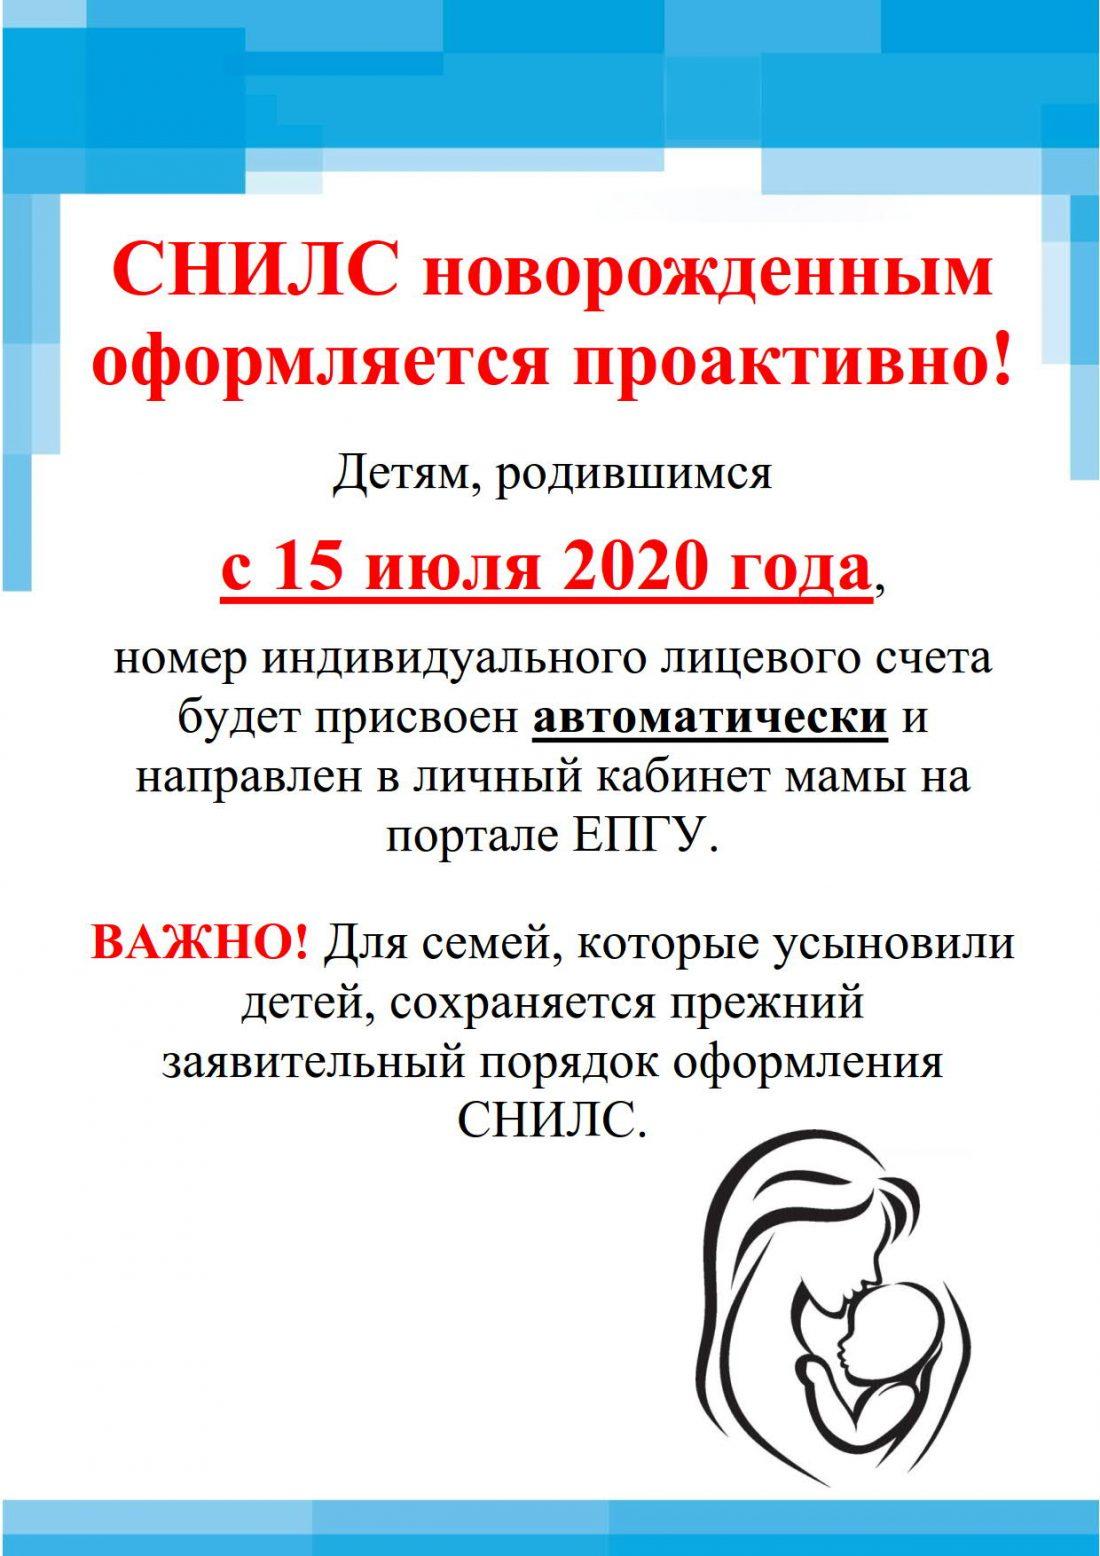 СНИЛС проактивно_1